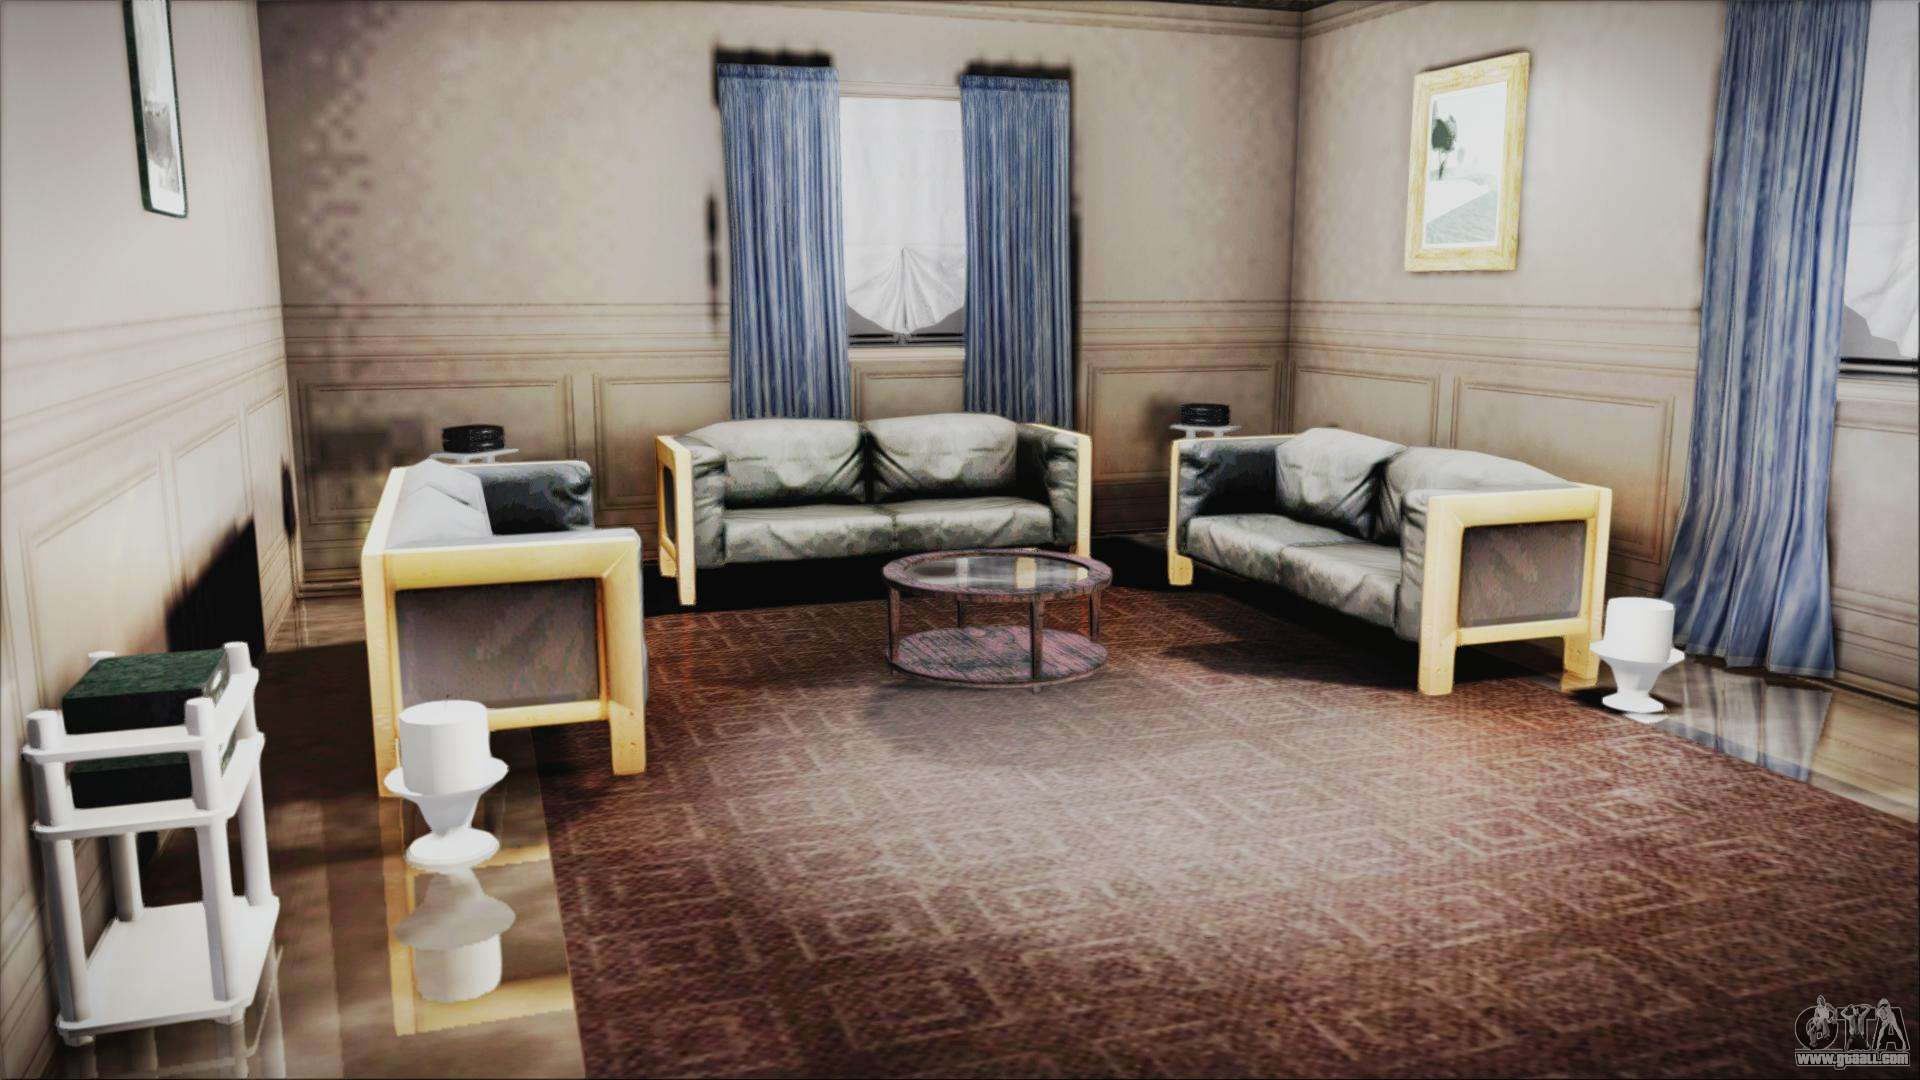 Cj house new interior for gta san andreas - New homes interior photos ...